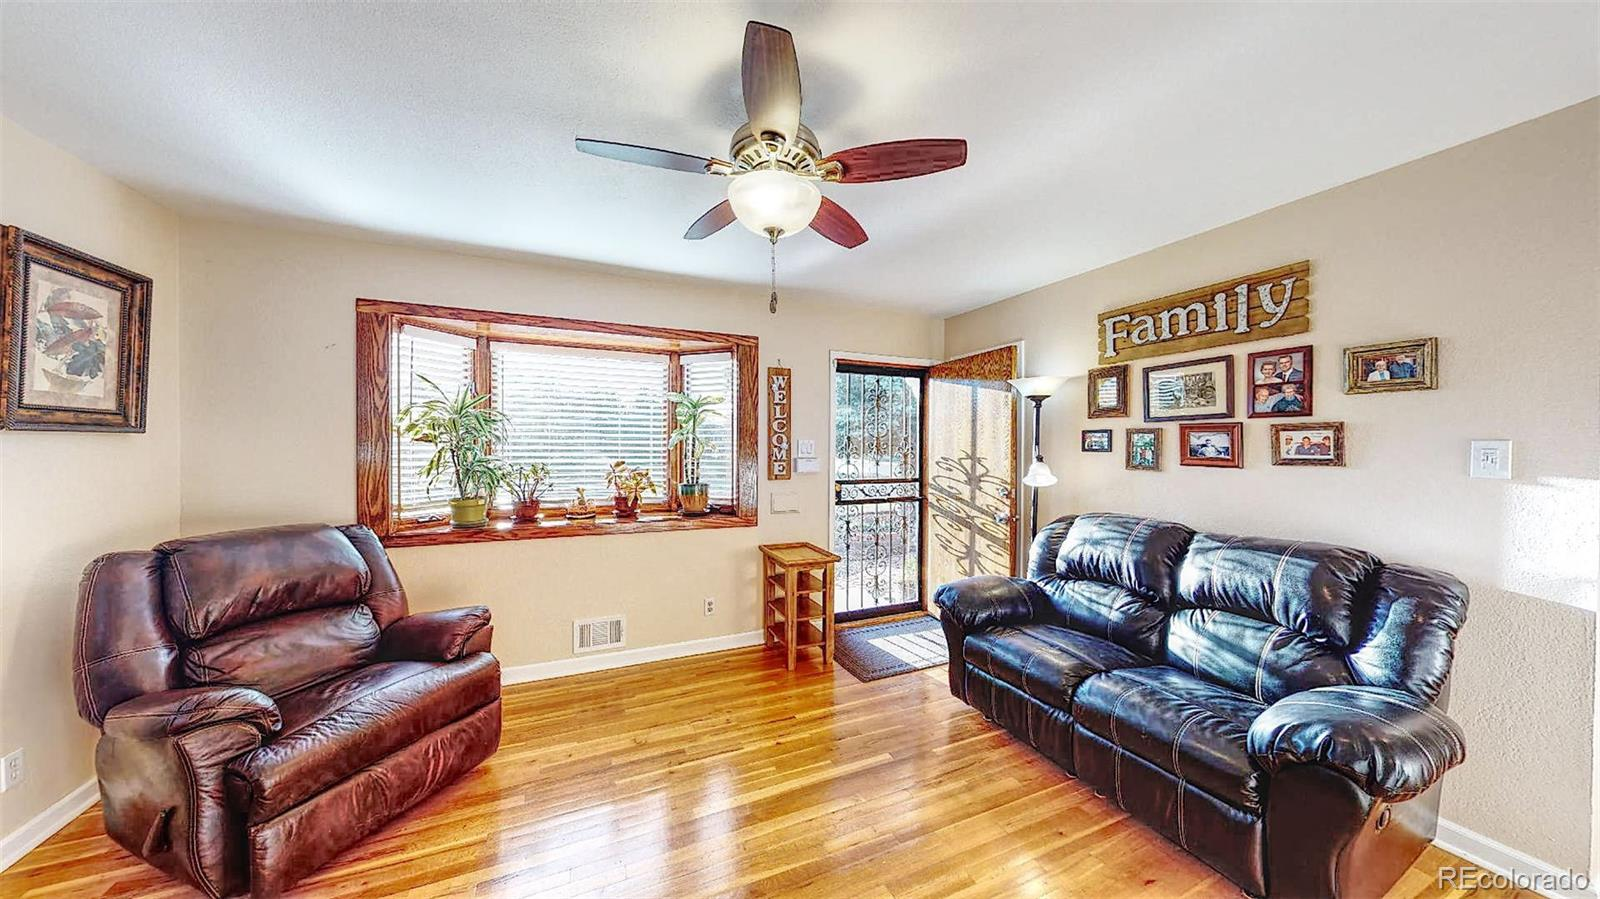 MLS# 6167151 - 9 - 1760 S Upham Street, Lakewood, CO 80232